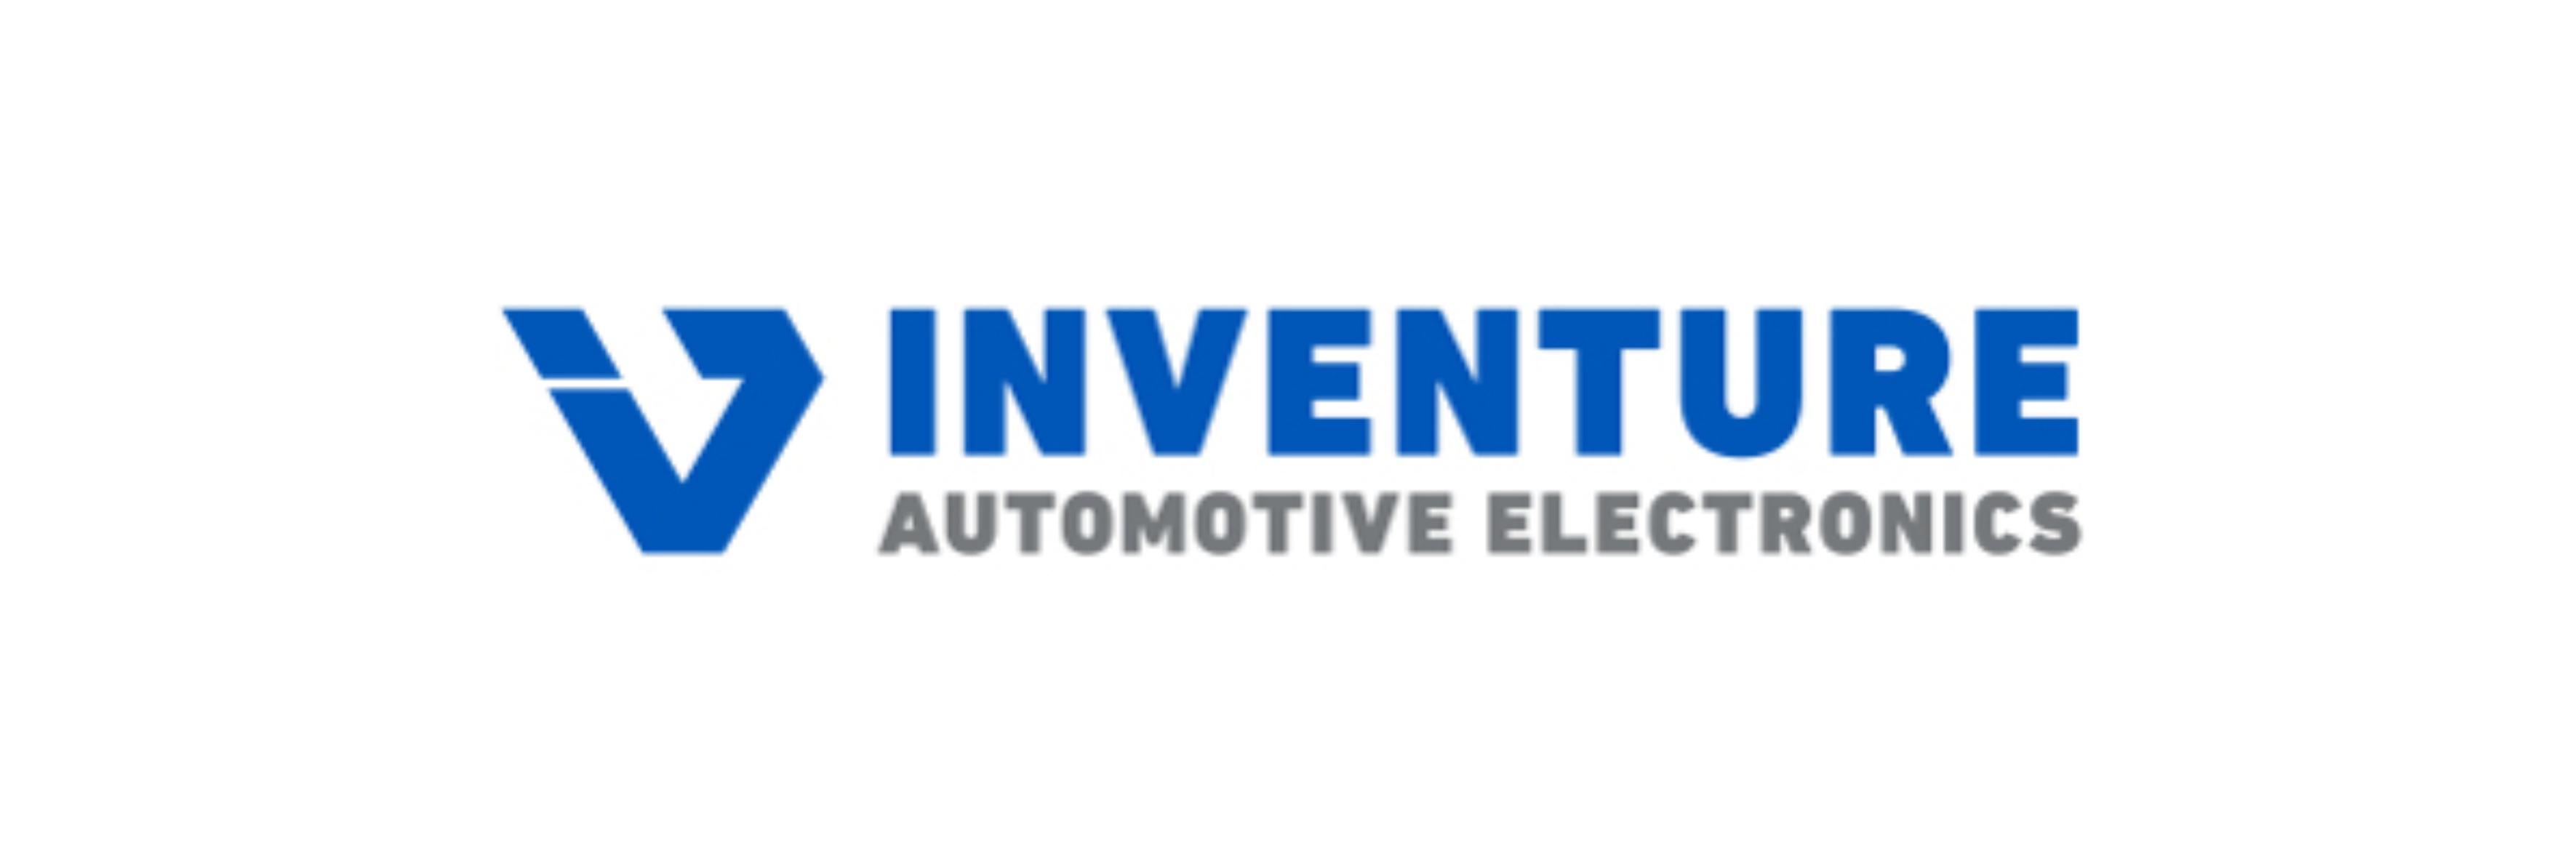 Inventure Automotive Electronics